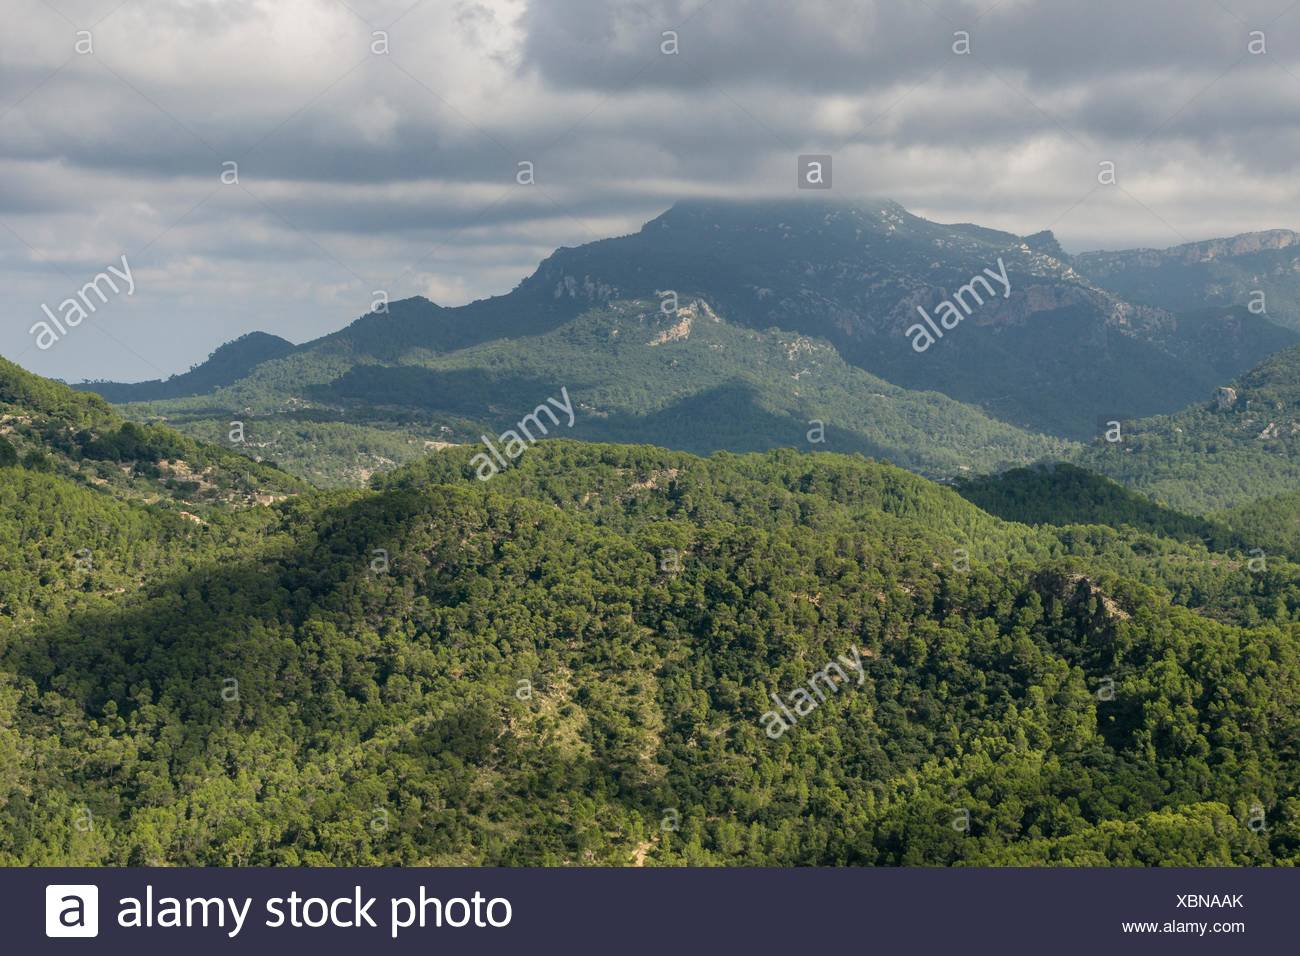 Pinar de Canet, Pinus halepensis, Esporles, Fita del Ram desde el Puig des Boixos, sierra de Tramuntana, Mallorca, Balearic Islands, Spain - Stock Image